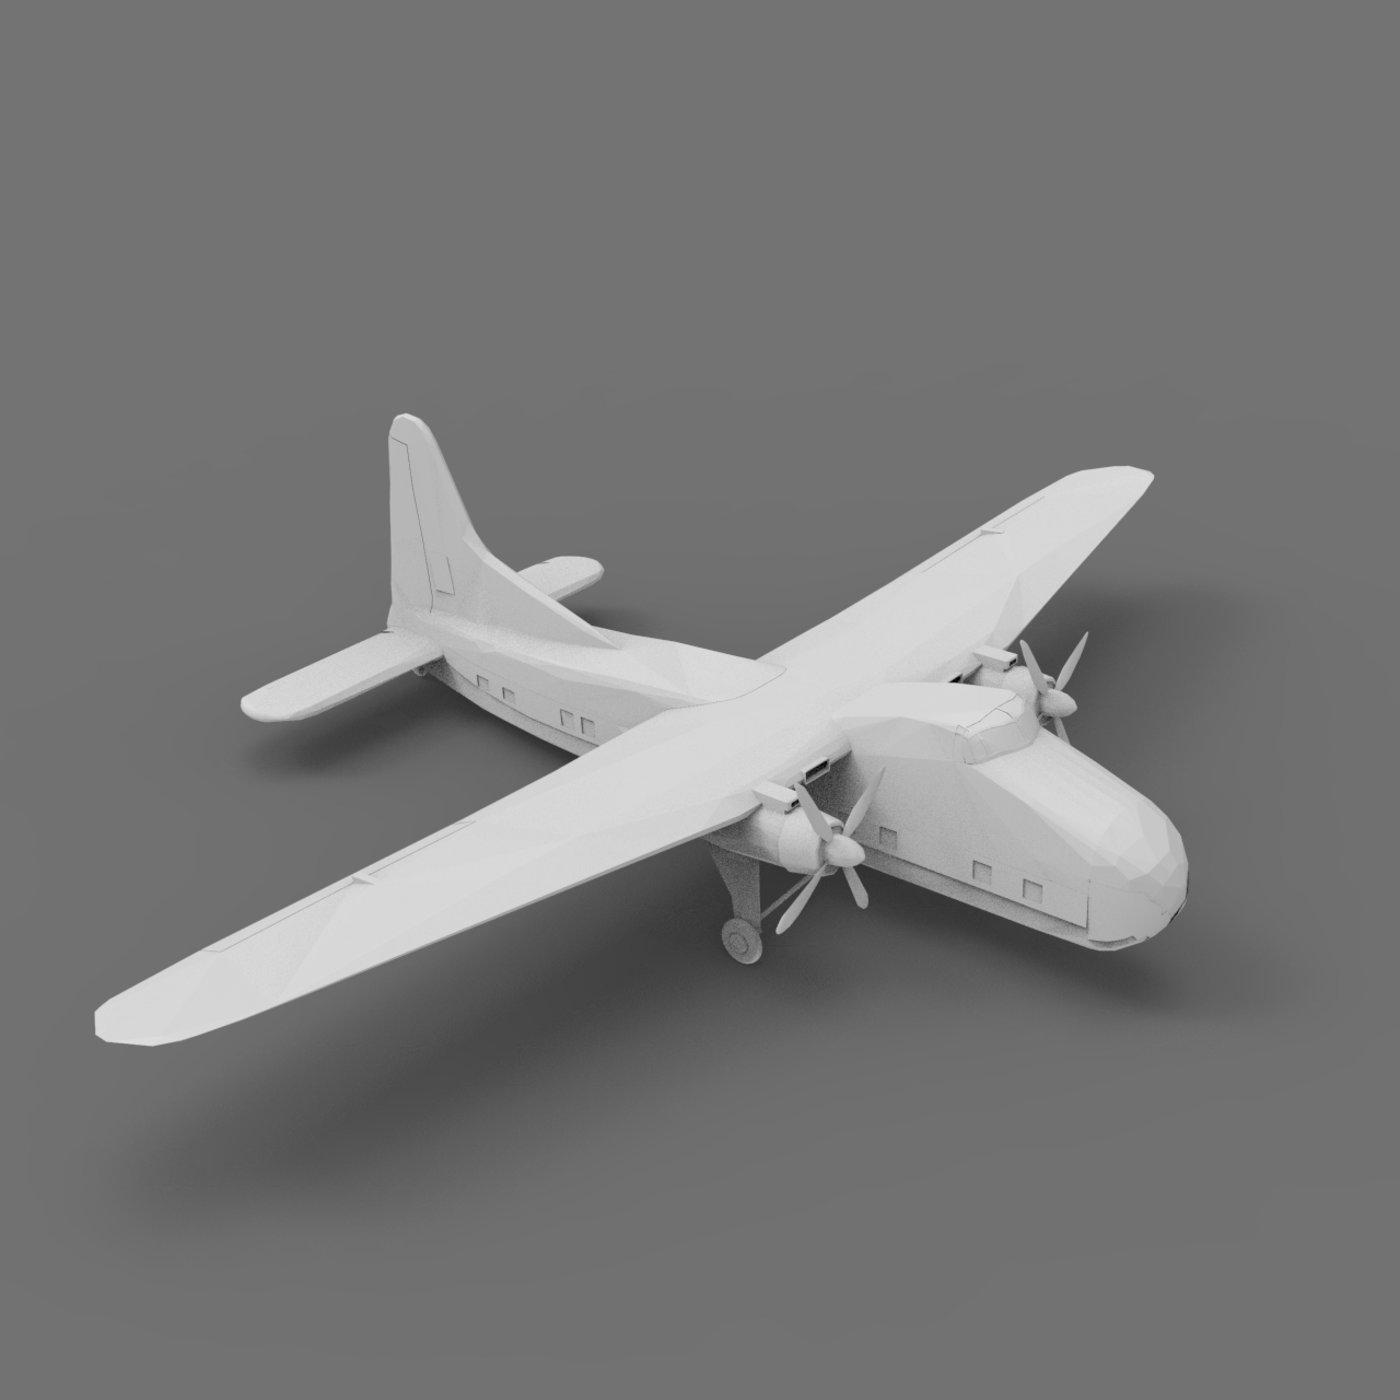 Bristol Freighter Mk32 (G-ANVR) Aircraft